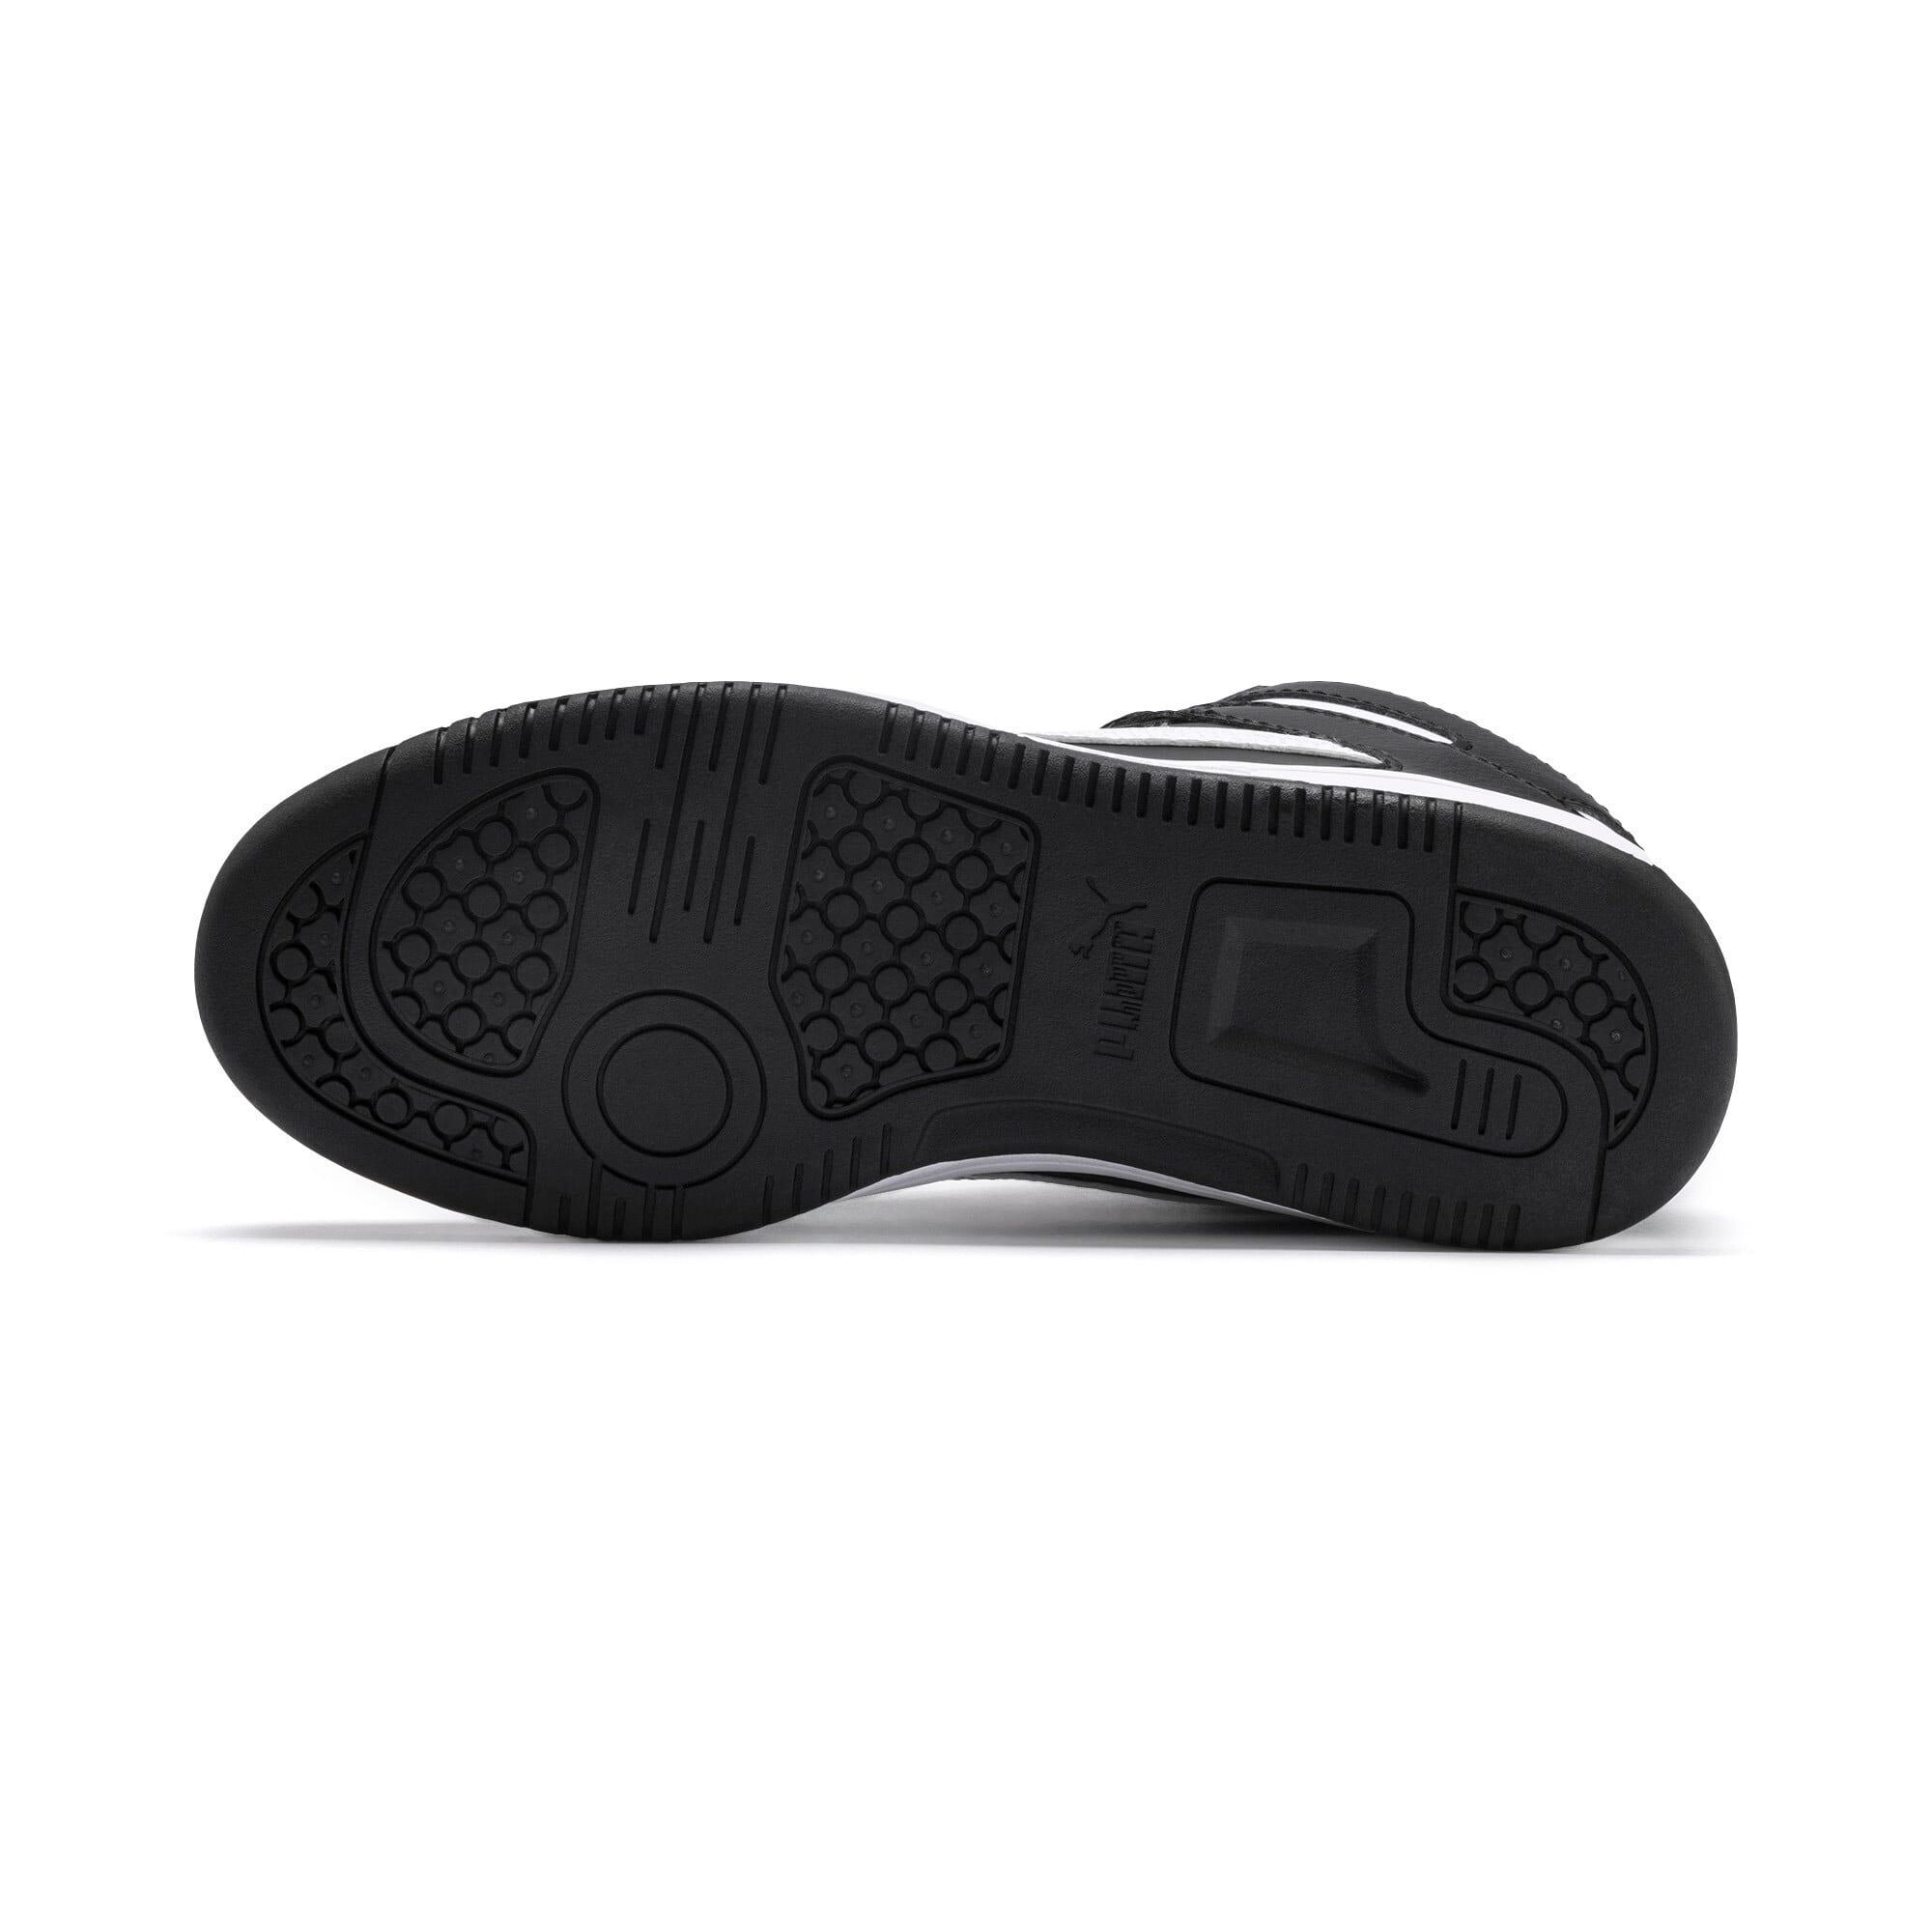 Thumbnail 4 of PUMA Rebound LayUp Mid Sneakers JR, Puma Black-Puma White, medium